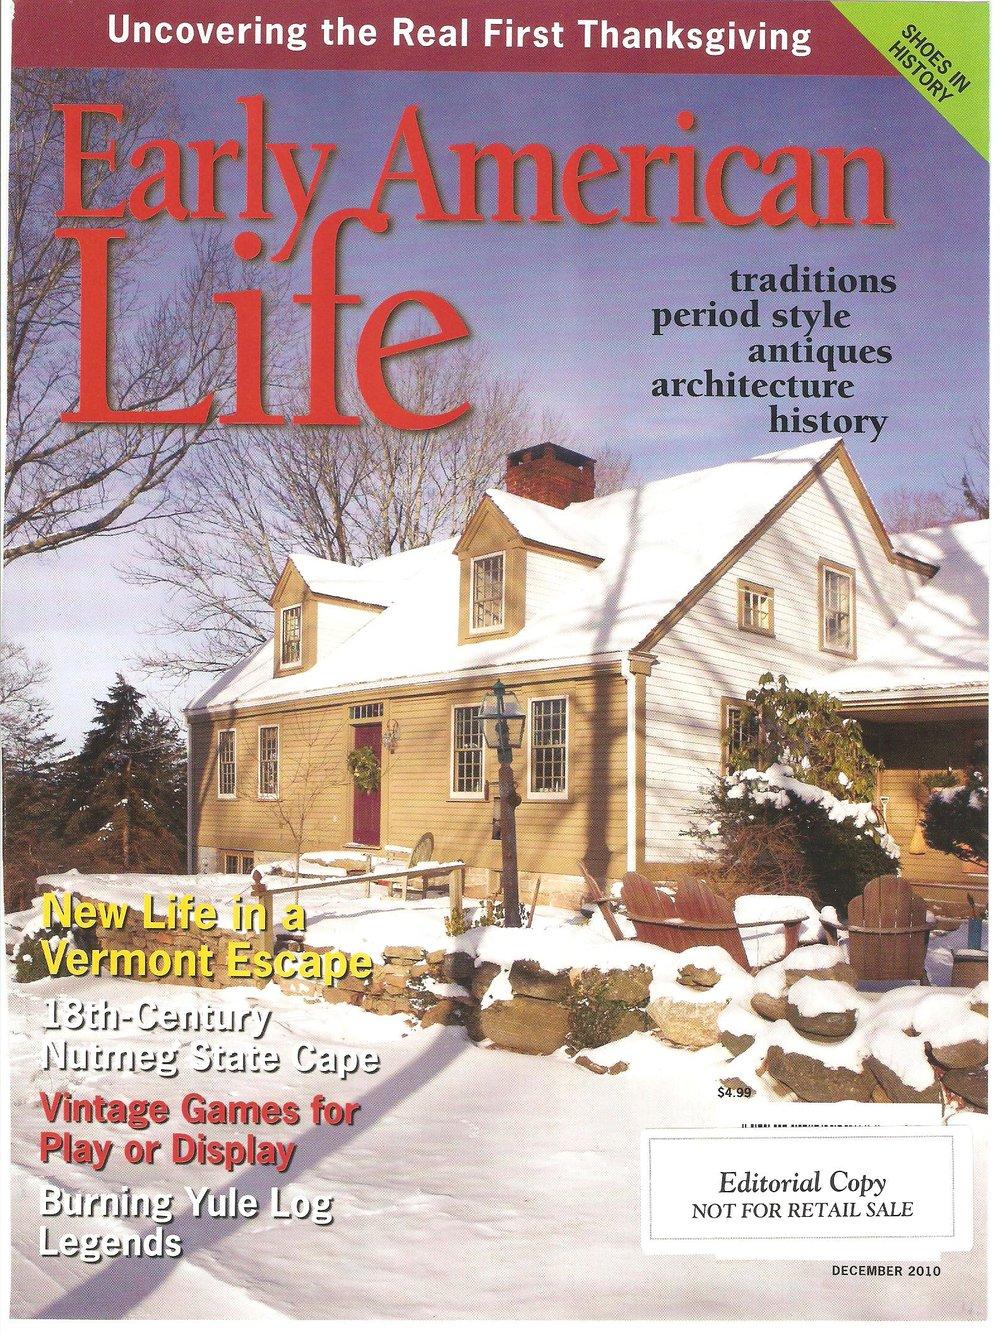 Early American Life Magazine.jpg